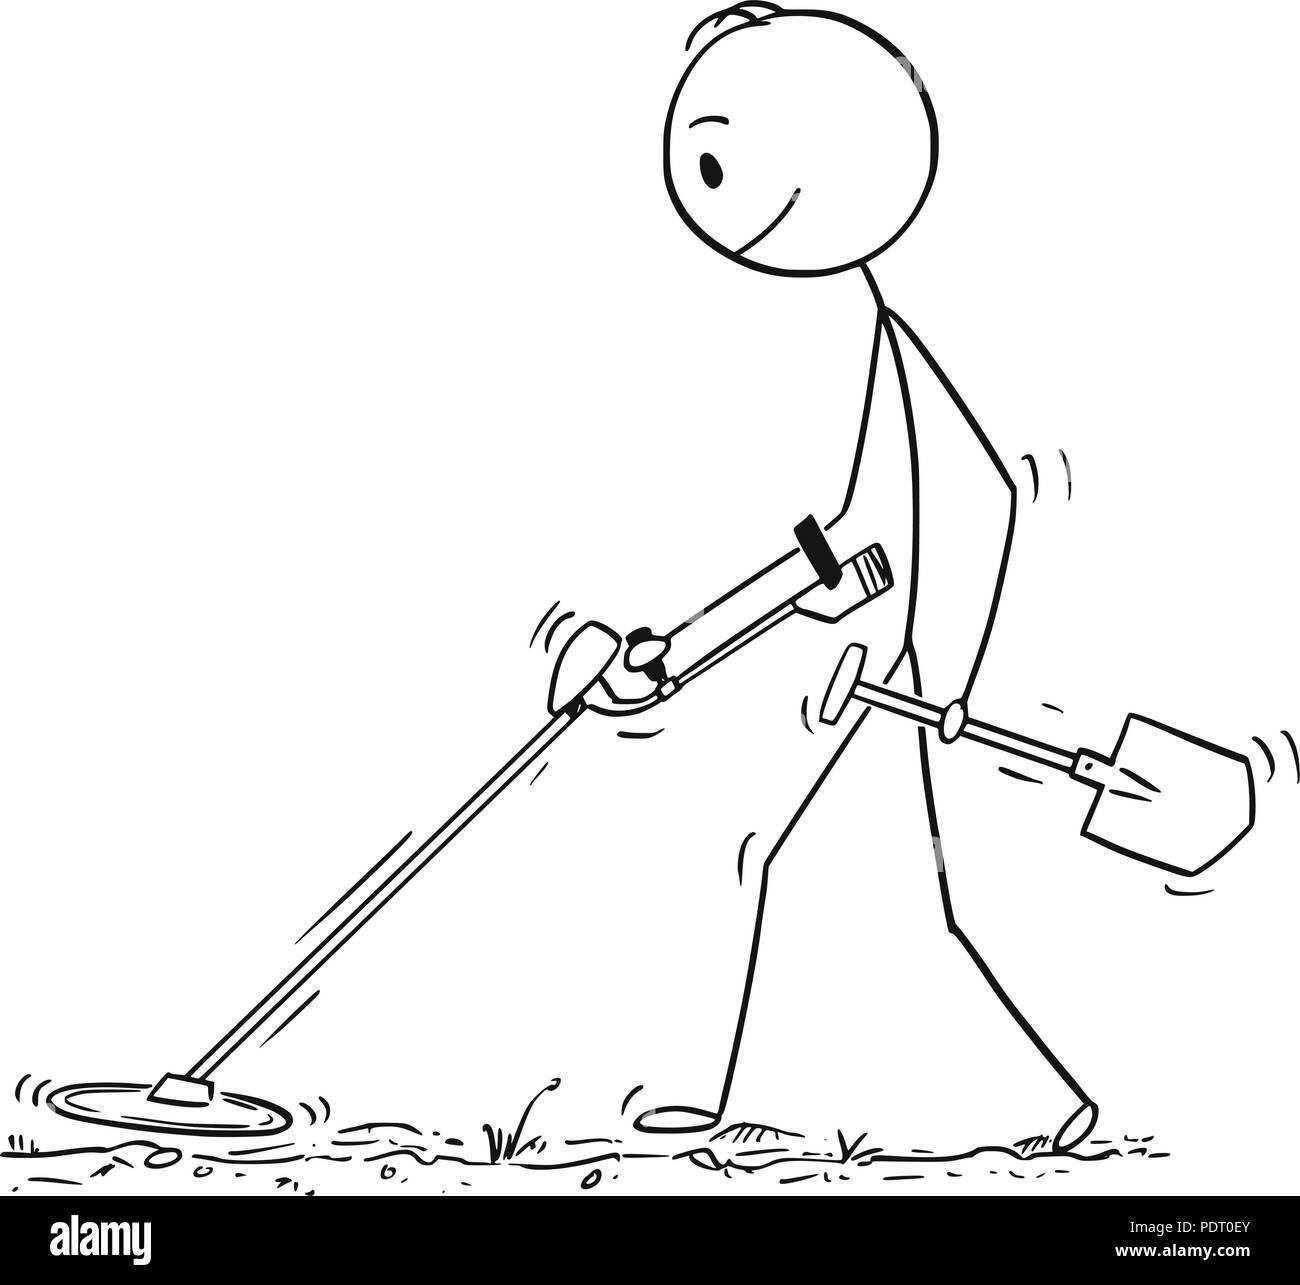 Jew Detector: Cartoon Of Man Searching For Treasure With Metal Detector